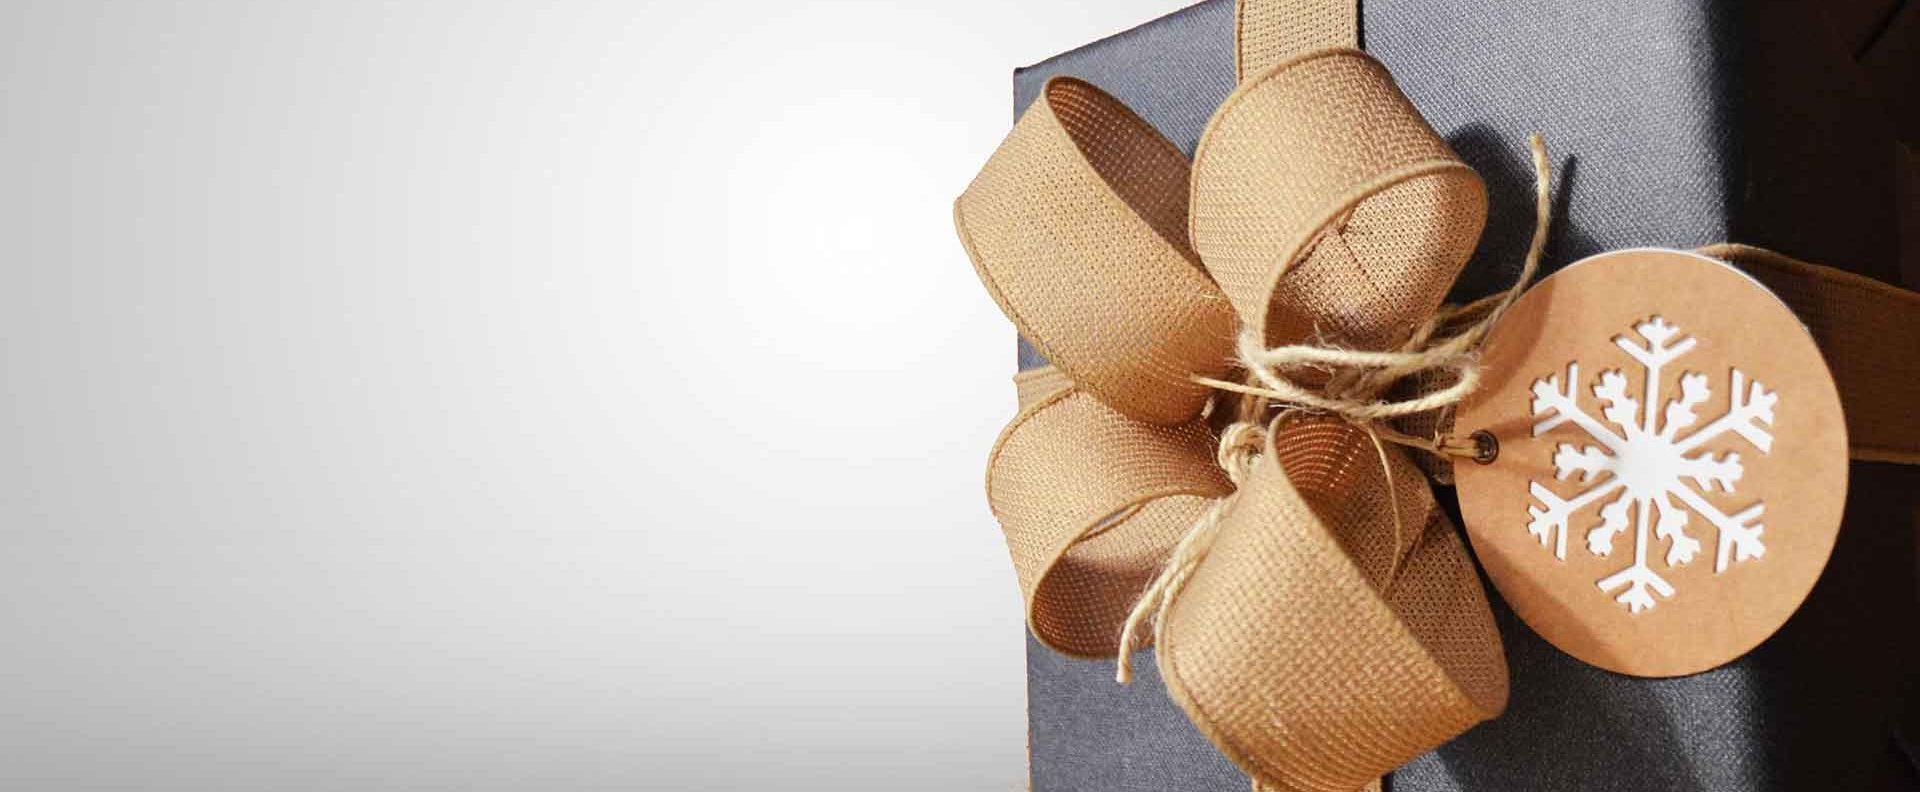 Spiritual Gifts - Healthy Growing Churches